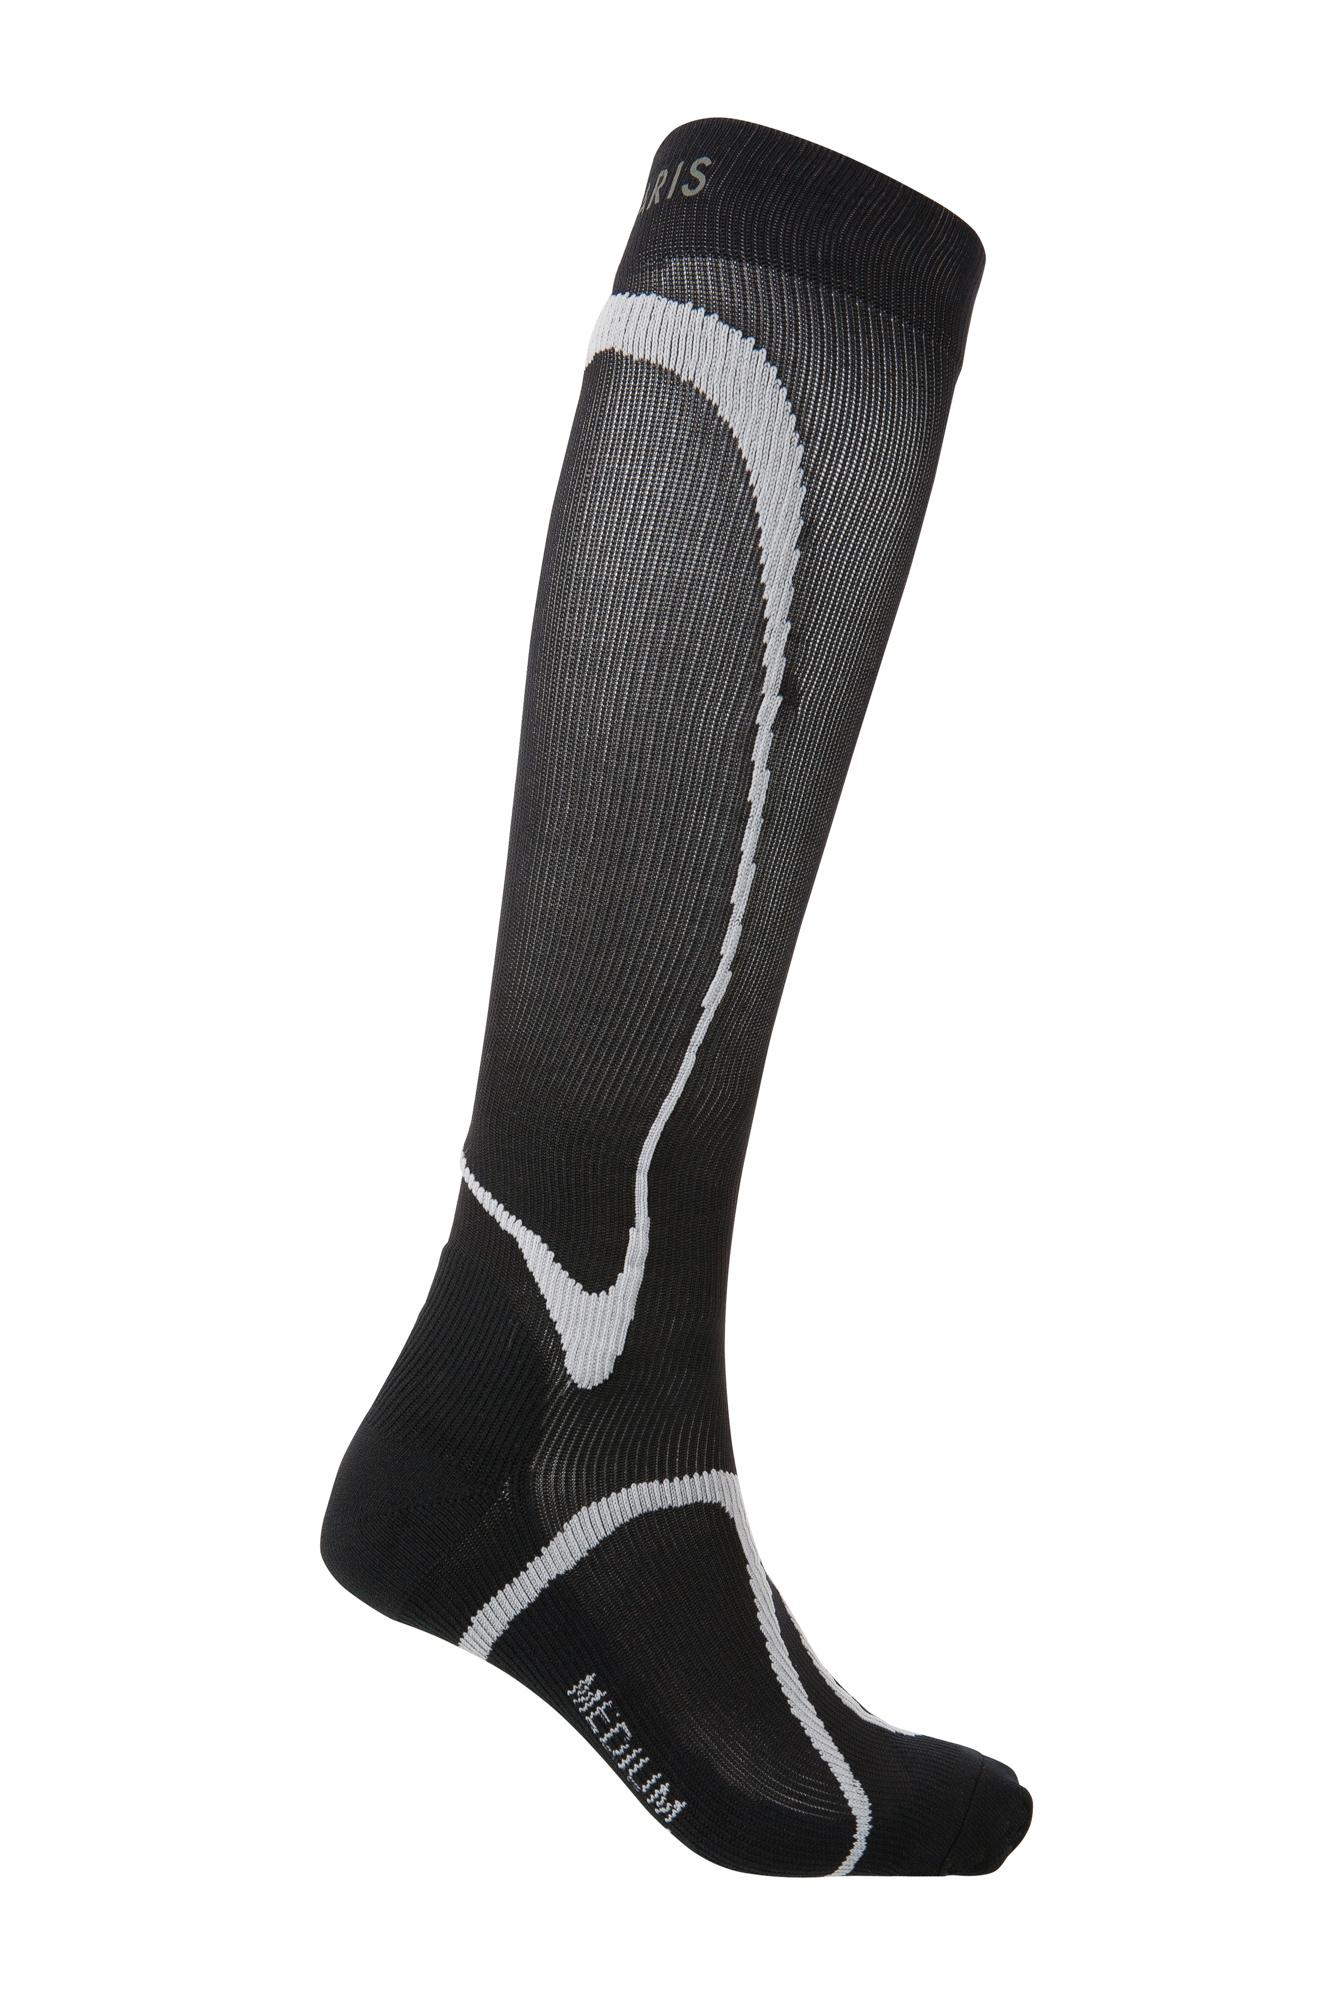 Sigvaris Performance Sports Running Compression Socks 20-30mmHg Black LGE 3 Closed Toe